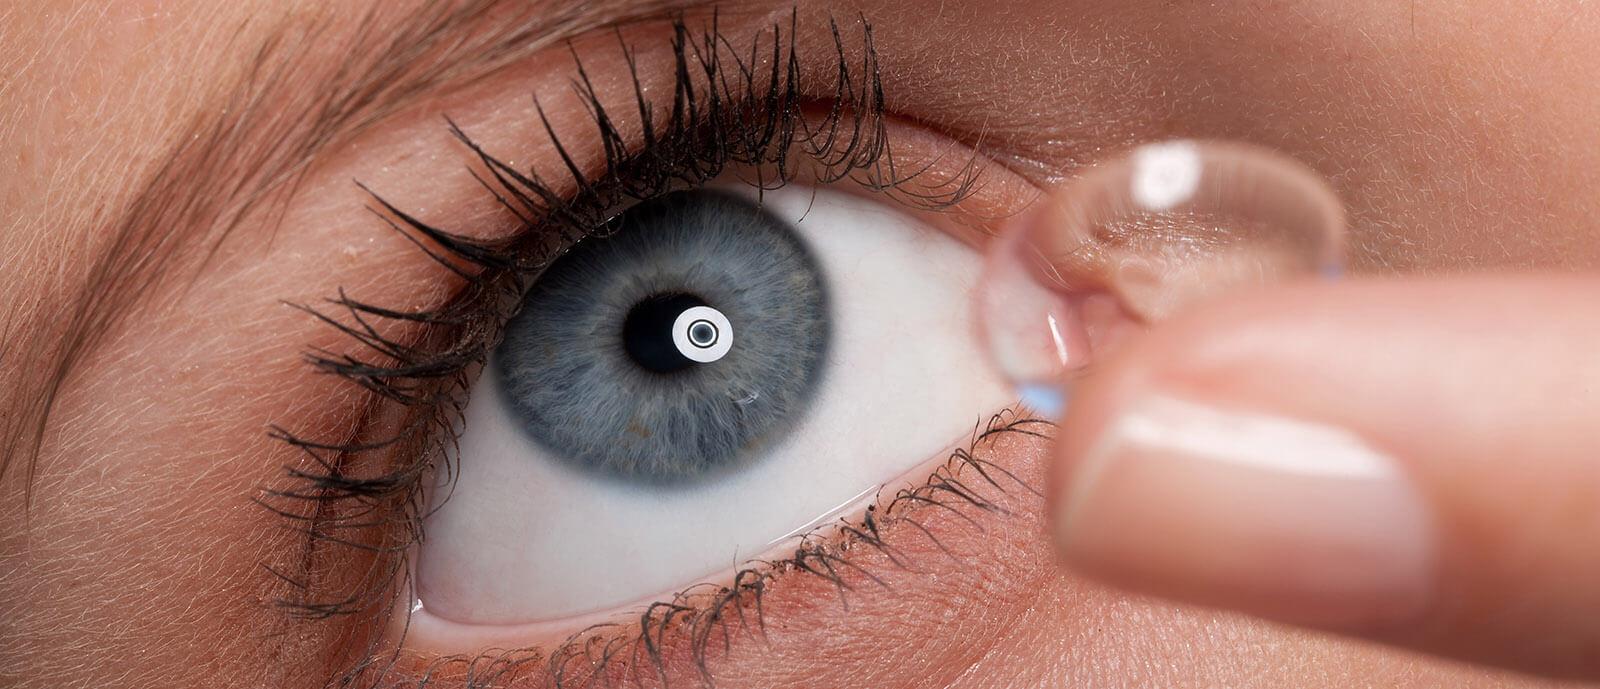 Contact lens application.